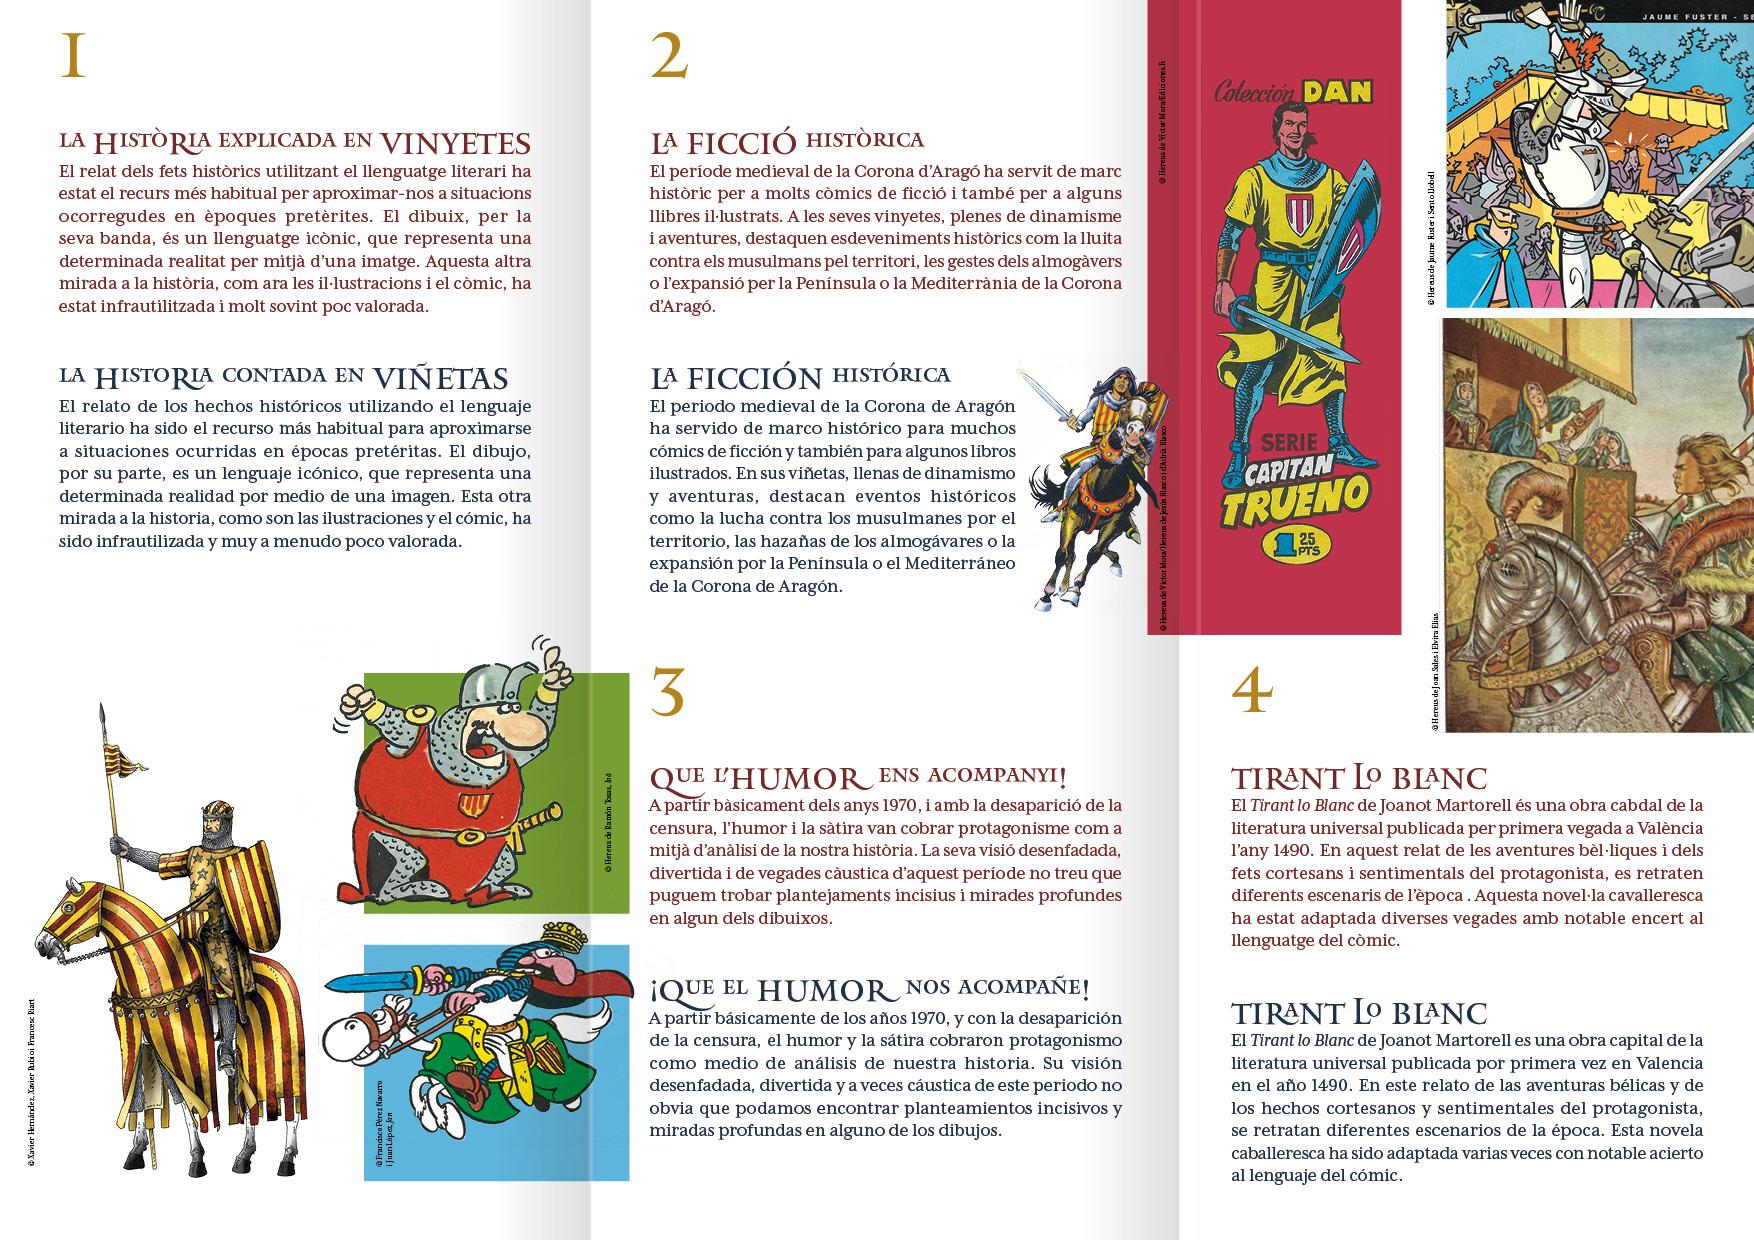 Corona_folleto_CAT-ES_LR2.jpg